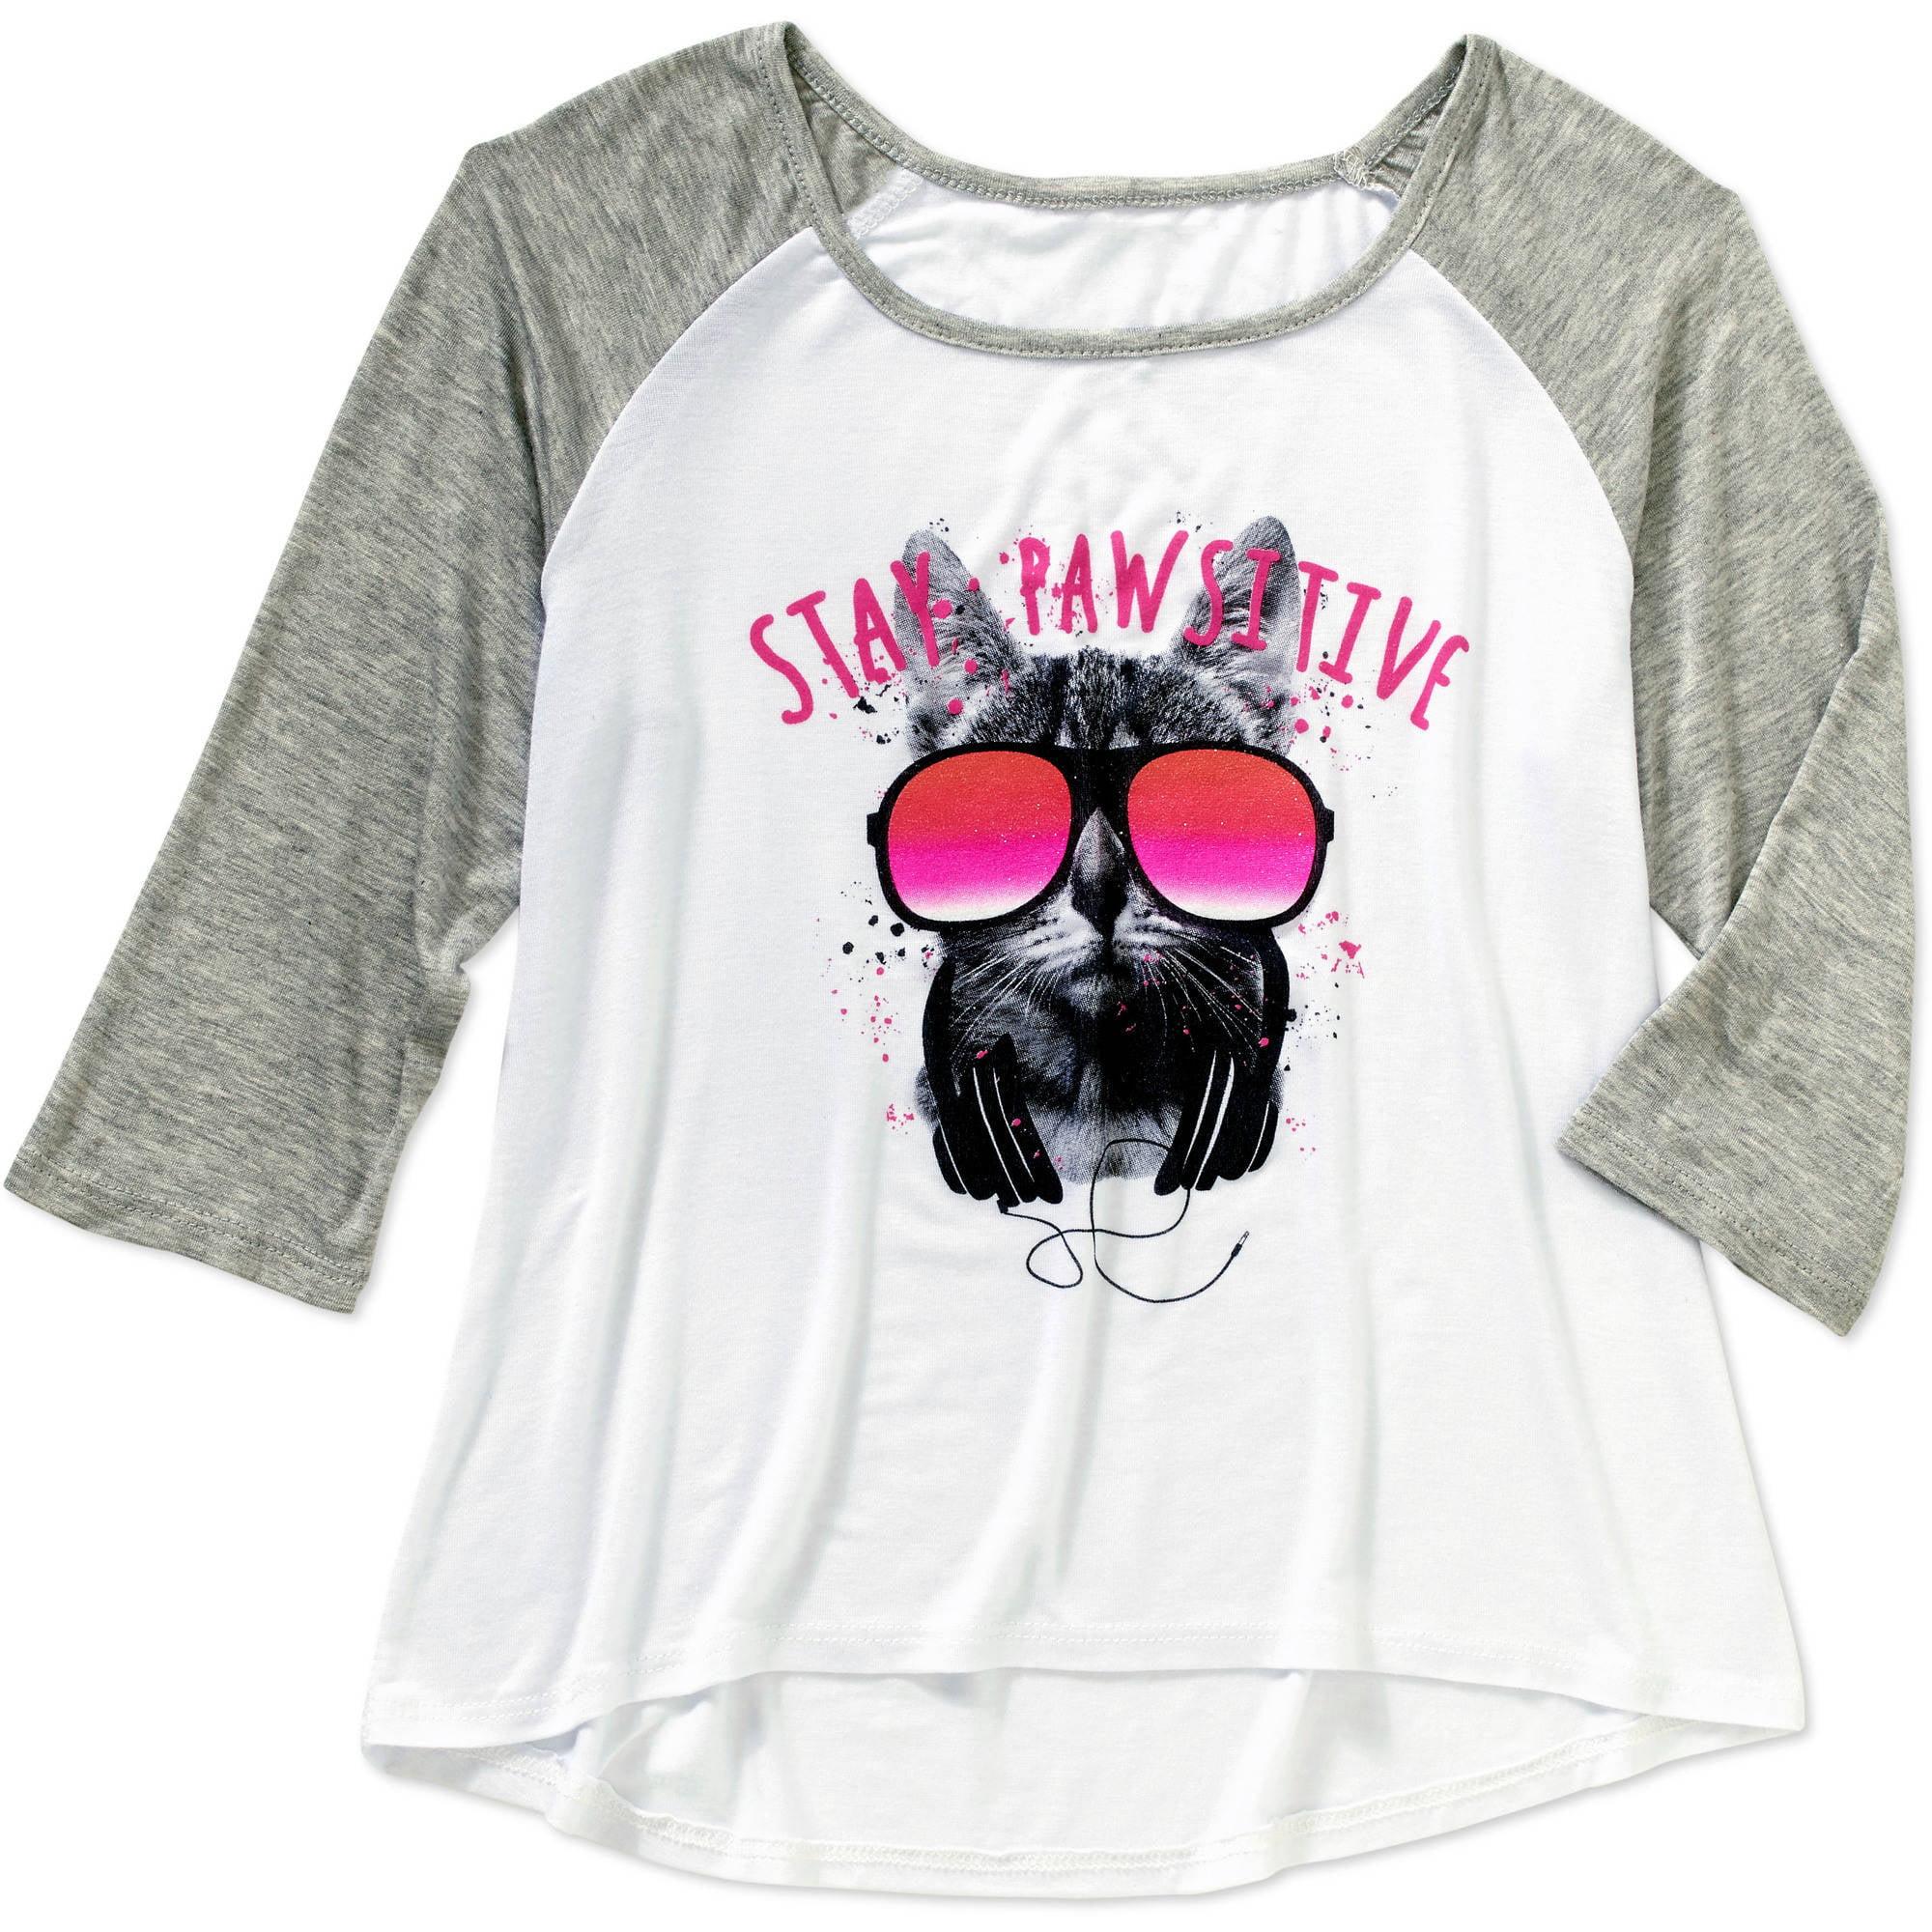 Miss Star Girls' Purfectly Sweet Jersey T-Shirt